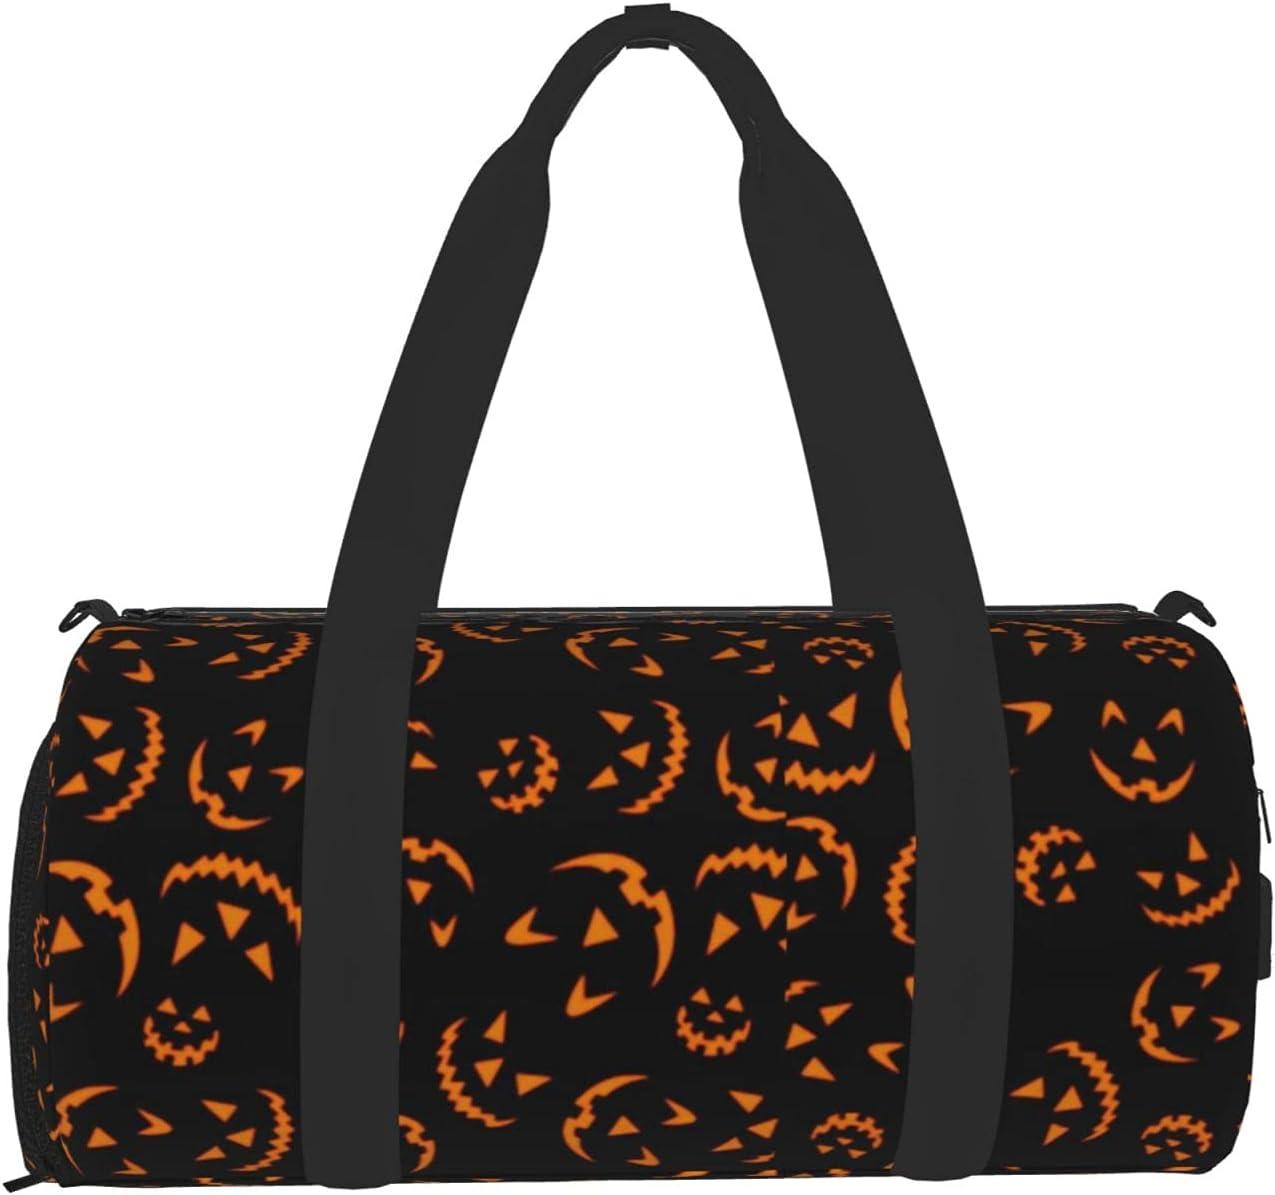 WMDYFYJ Gym Bag With Pumpkin Print Travel Max 81% OFF Weekend NO. National uniform free shipping Duffel